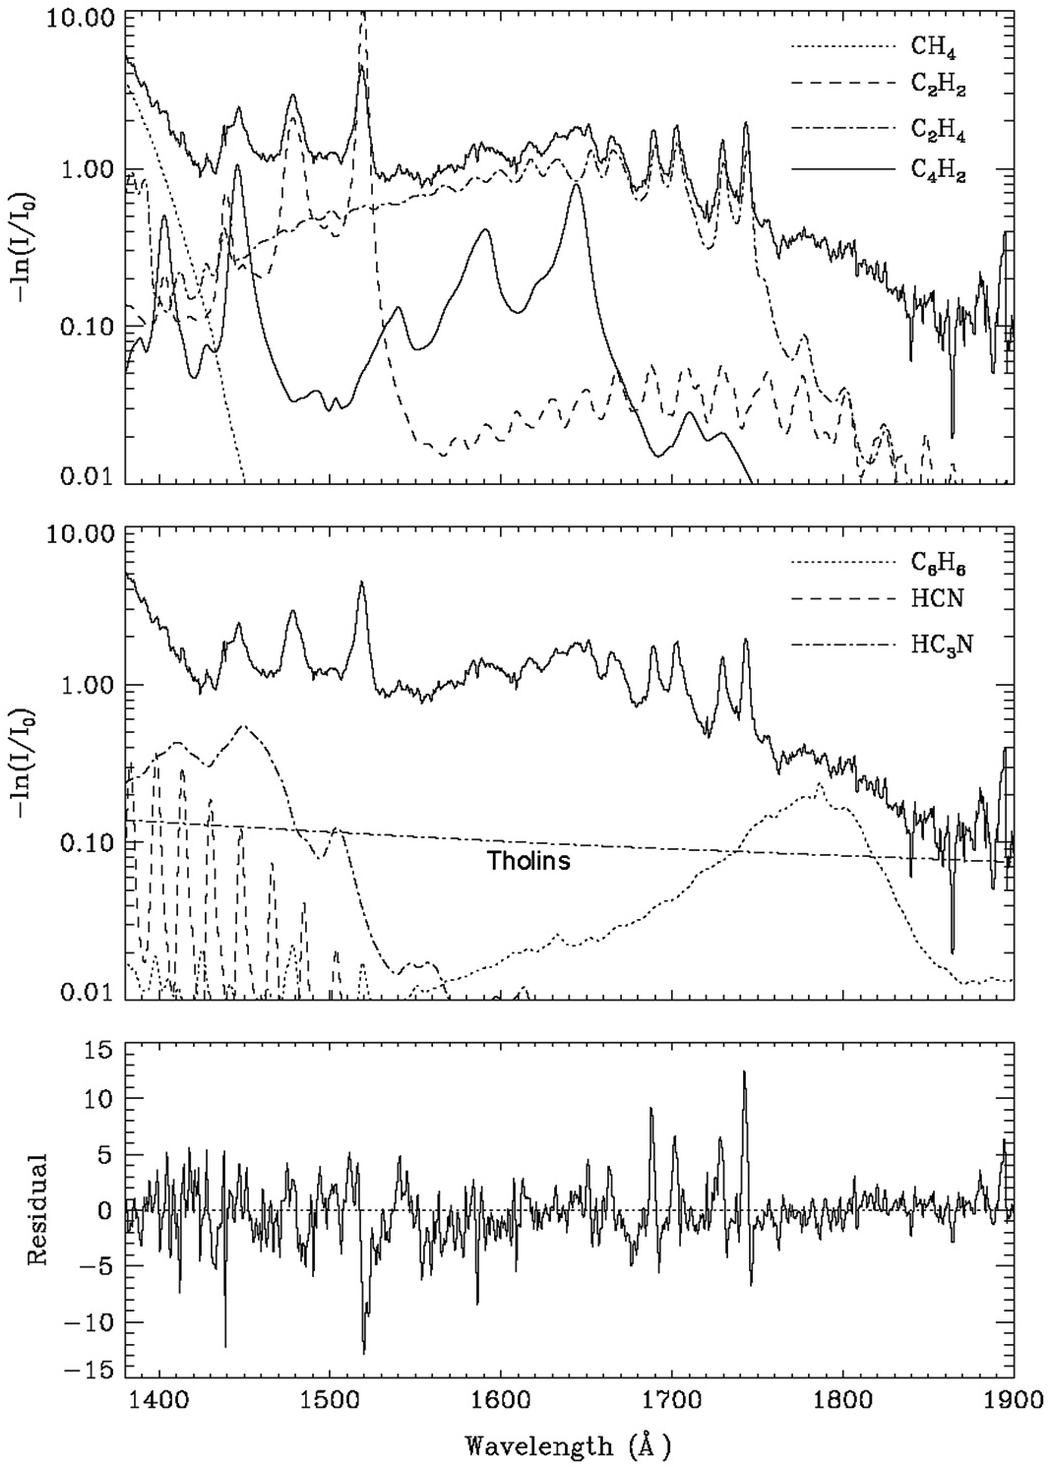 Titan (Chapter 13) - Spectroscopy and Photochemistry of